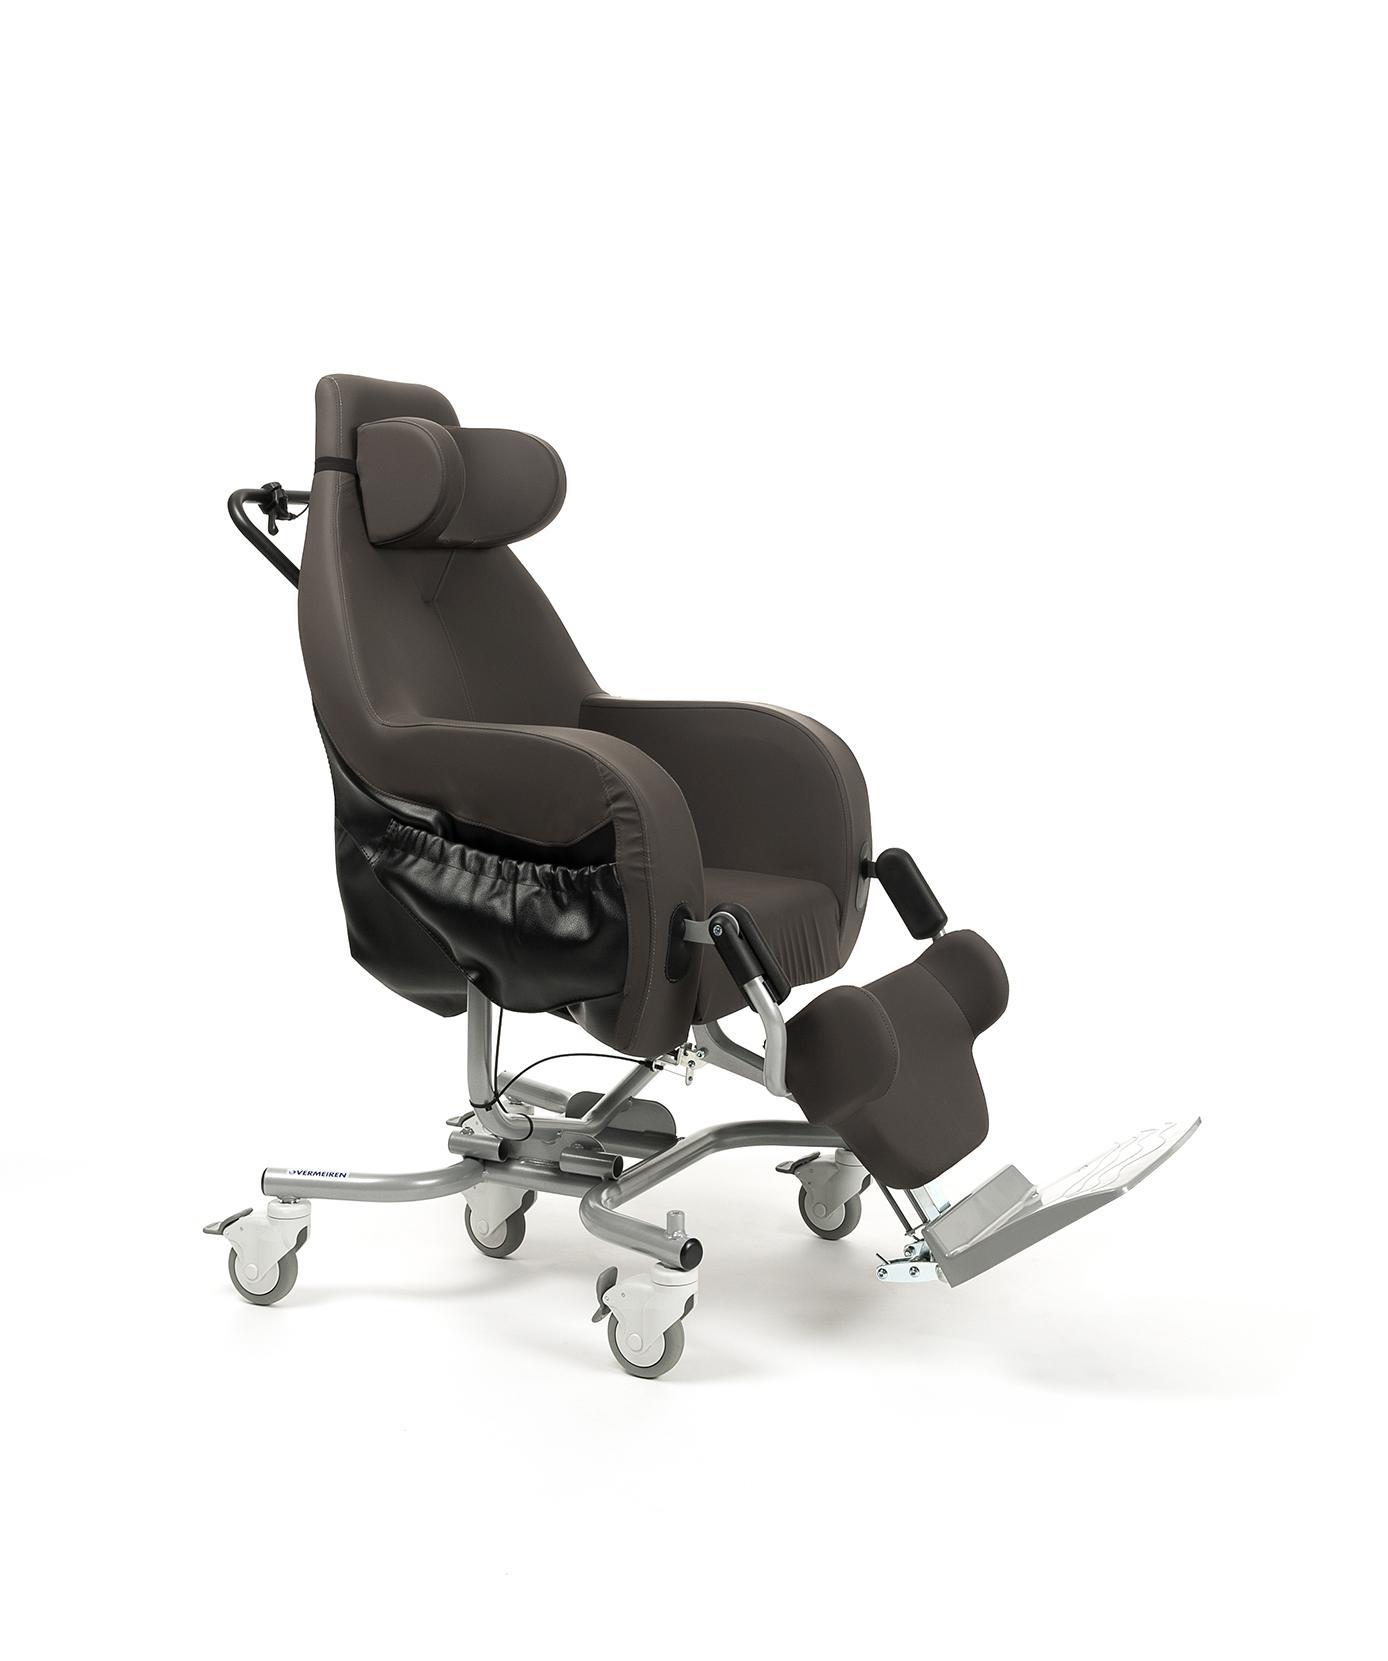 Кресло-коляска инвалидное Vermeiren Altitude